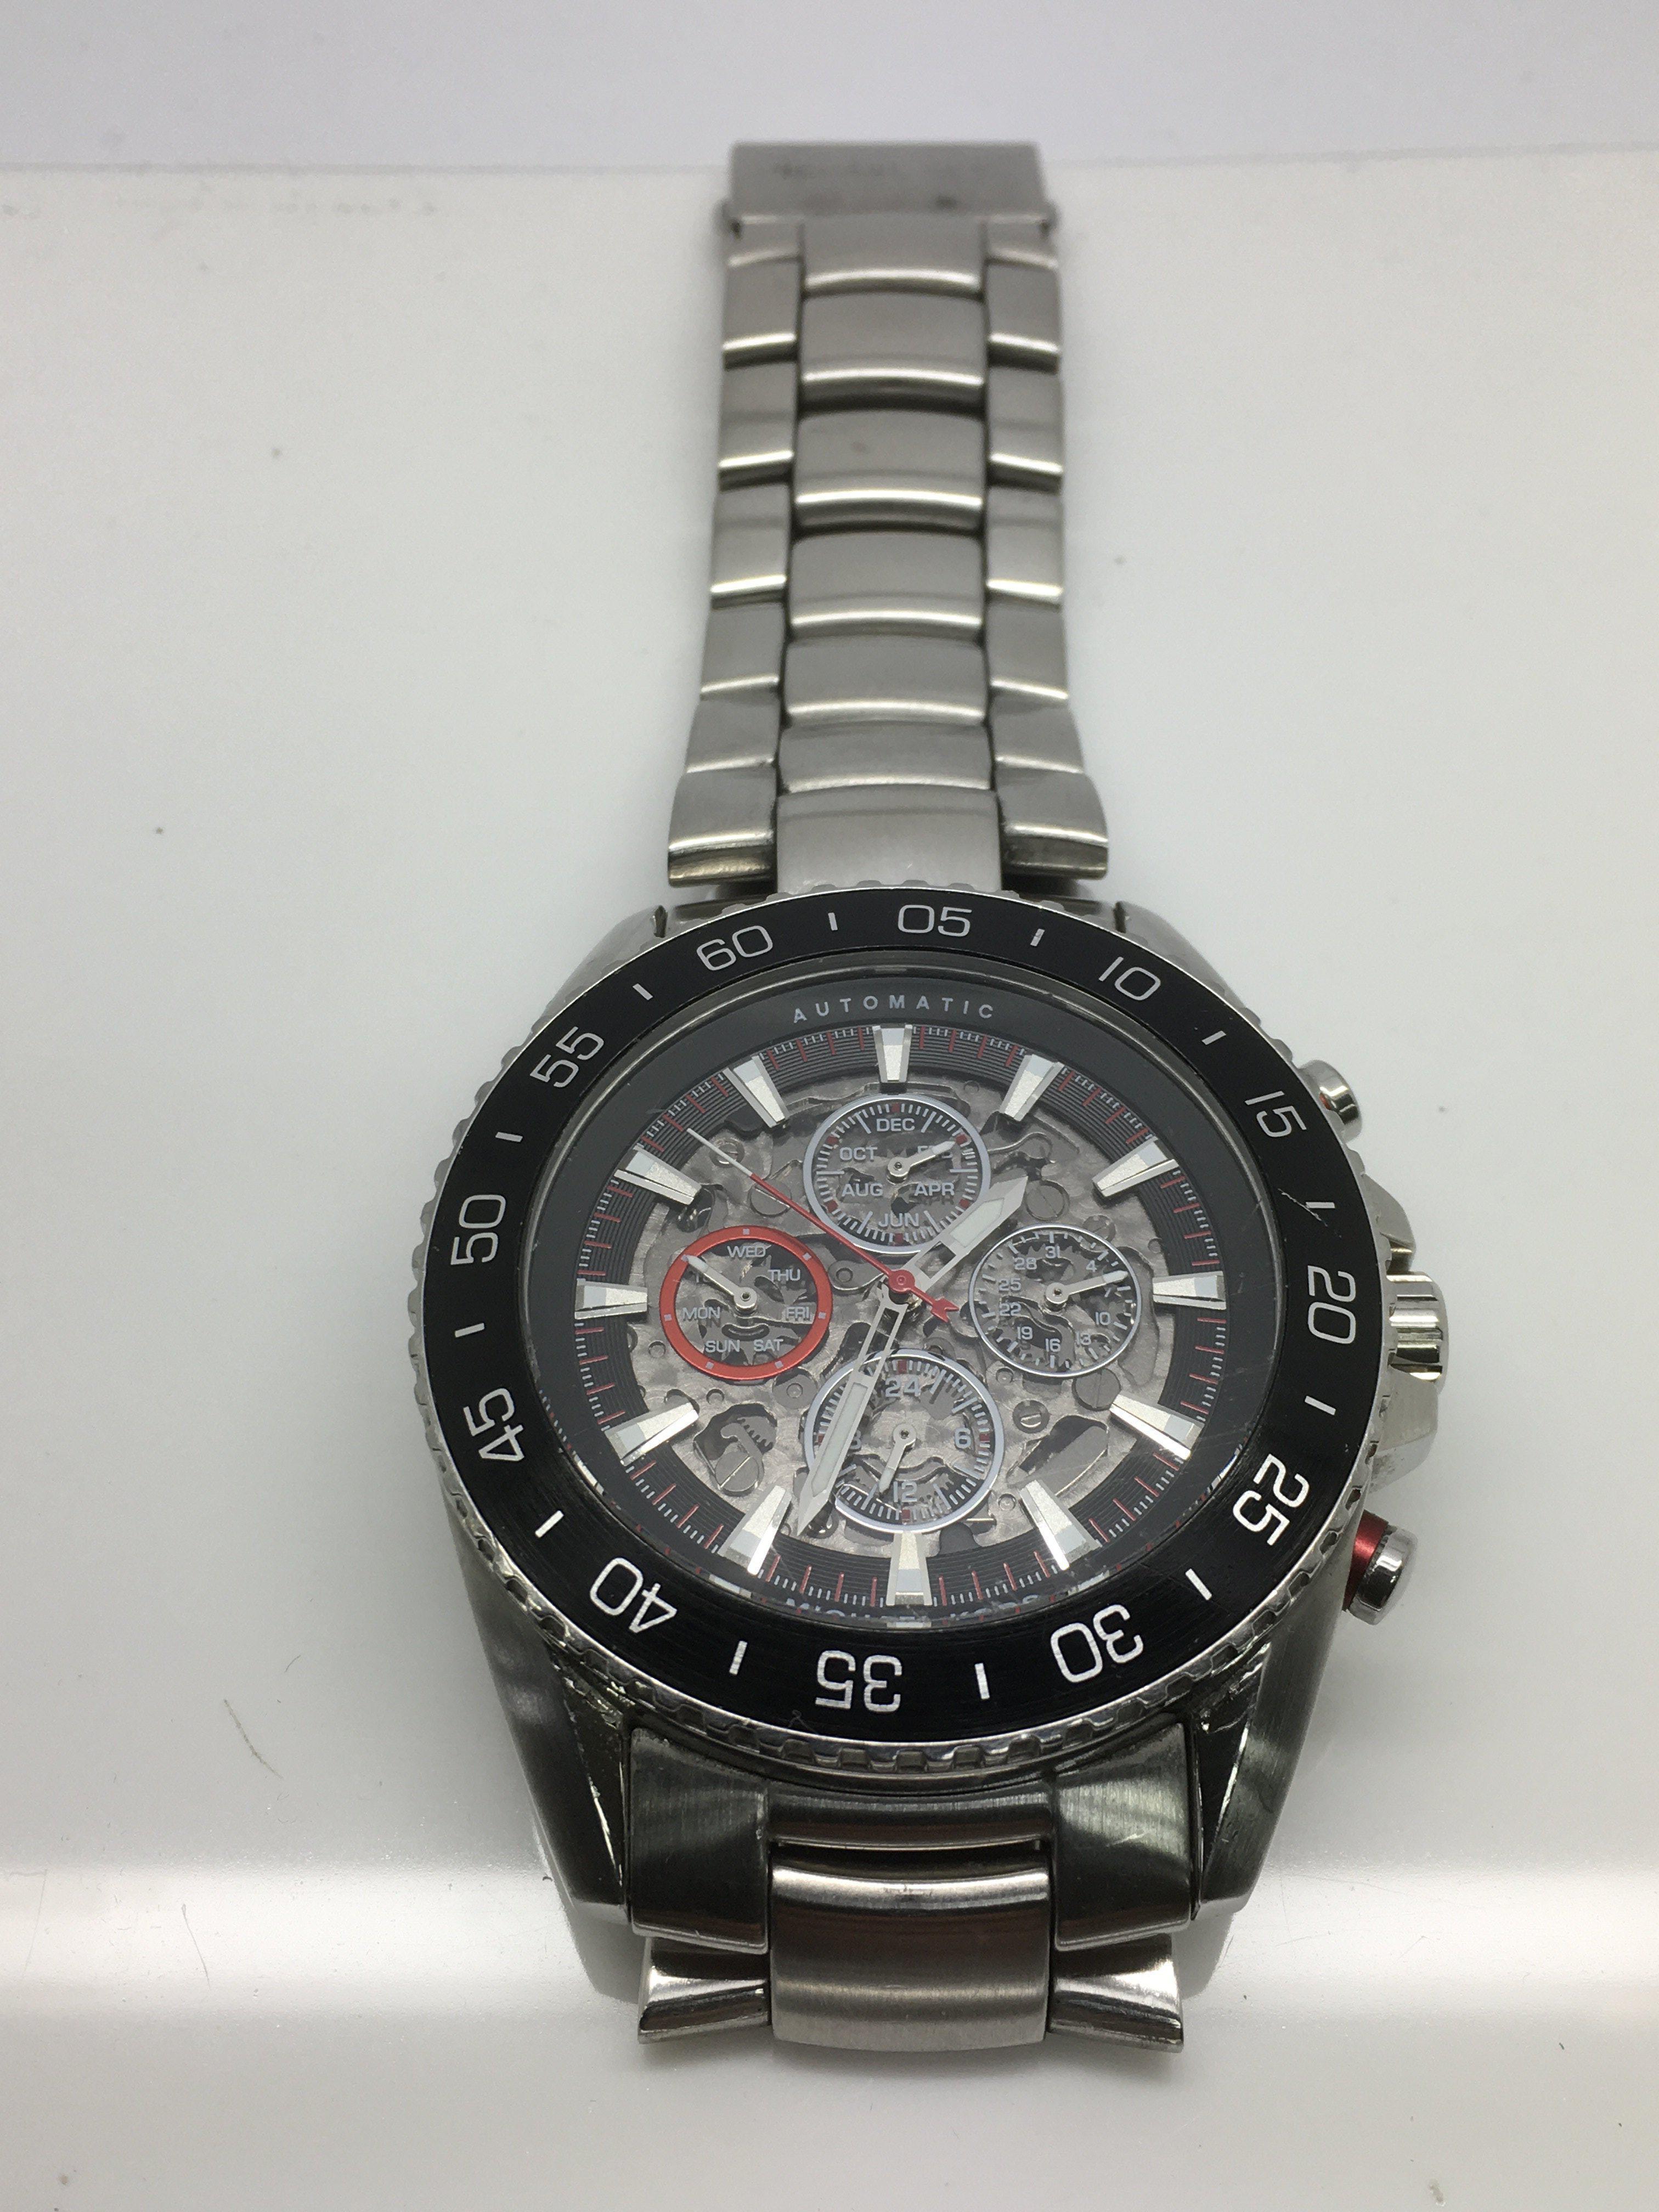 Lot 39 - A gents Michael Kors automatic chronograph watch.